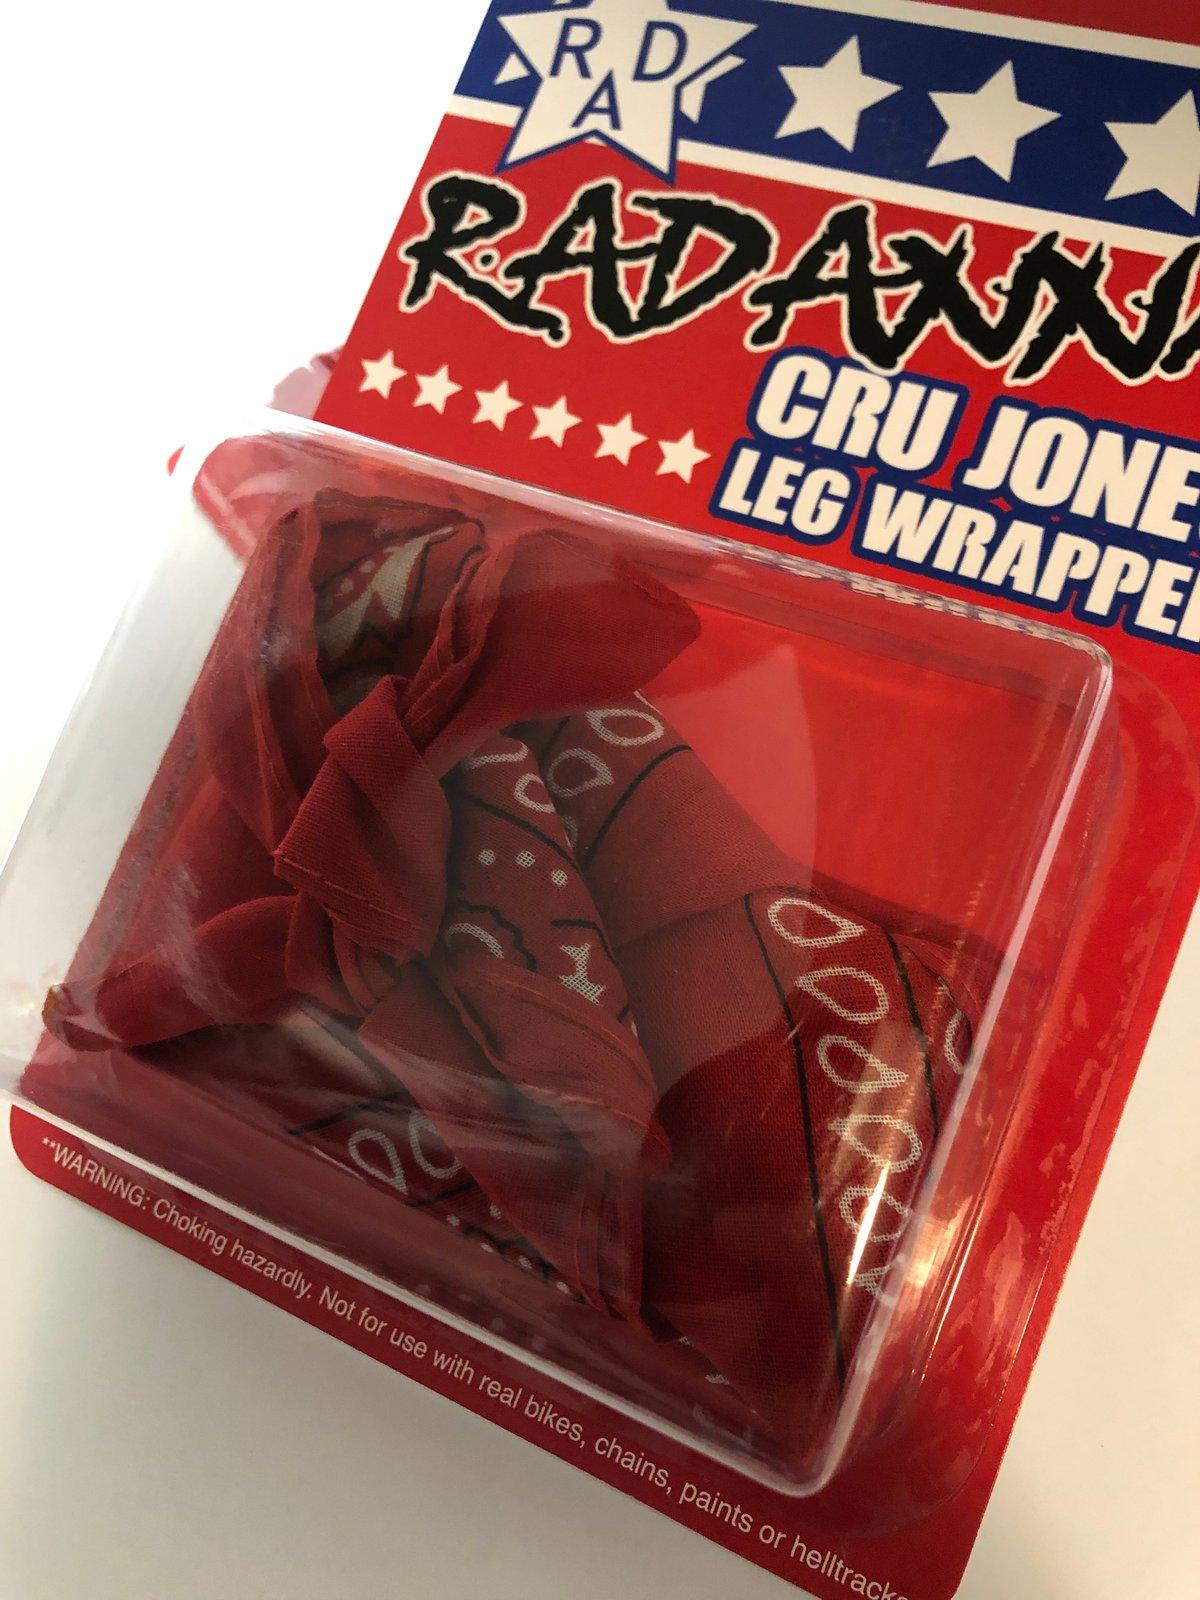 Image of RADANNA - CRU JONES LEG WRAPPER